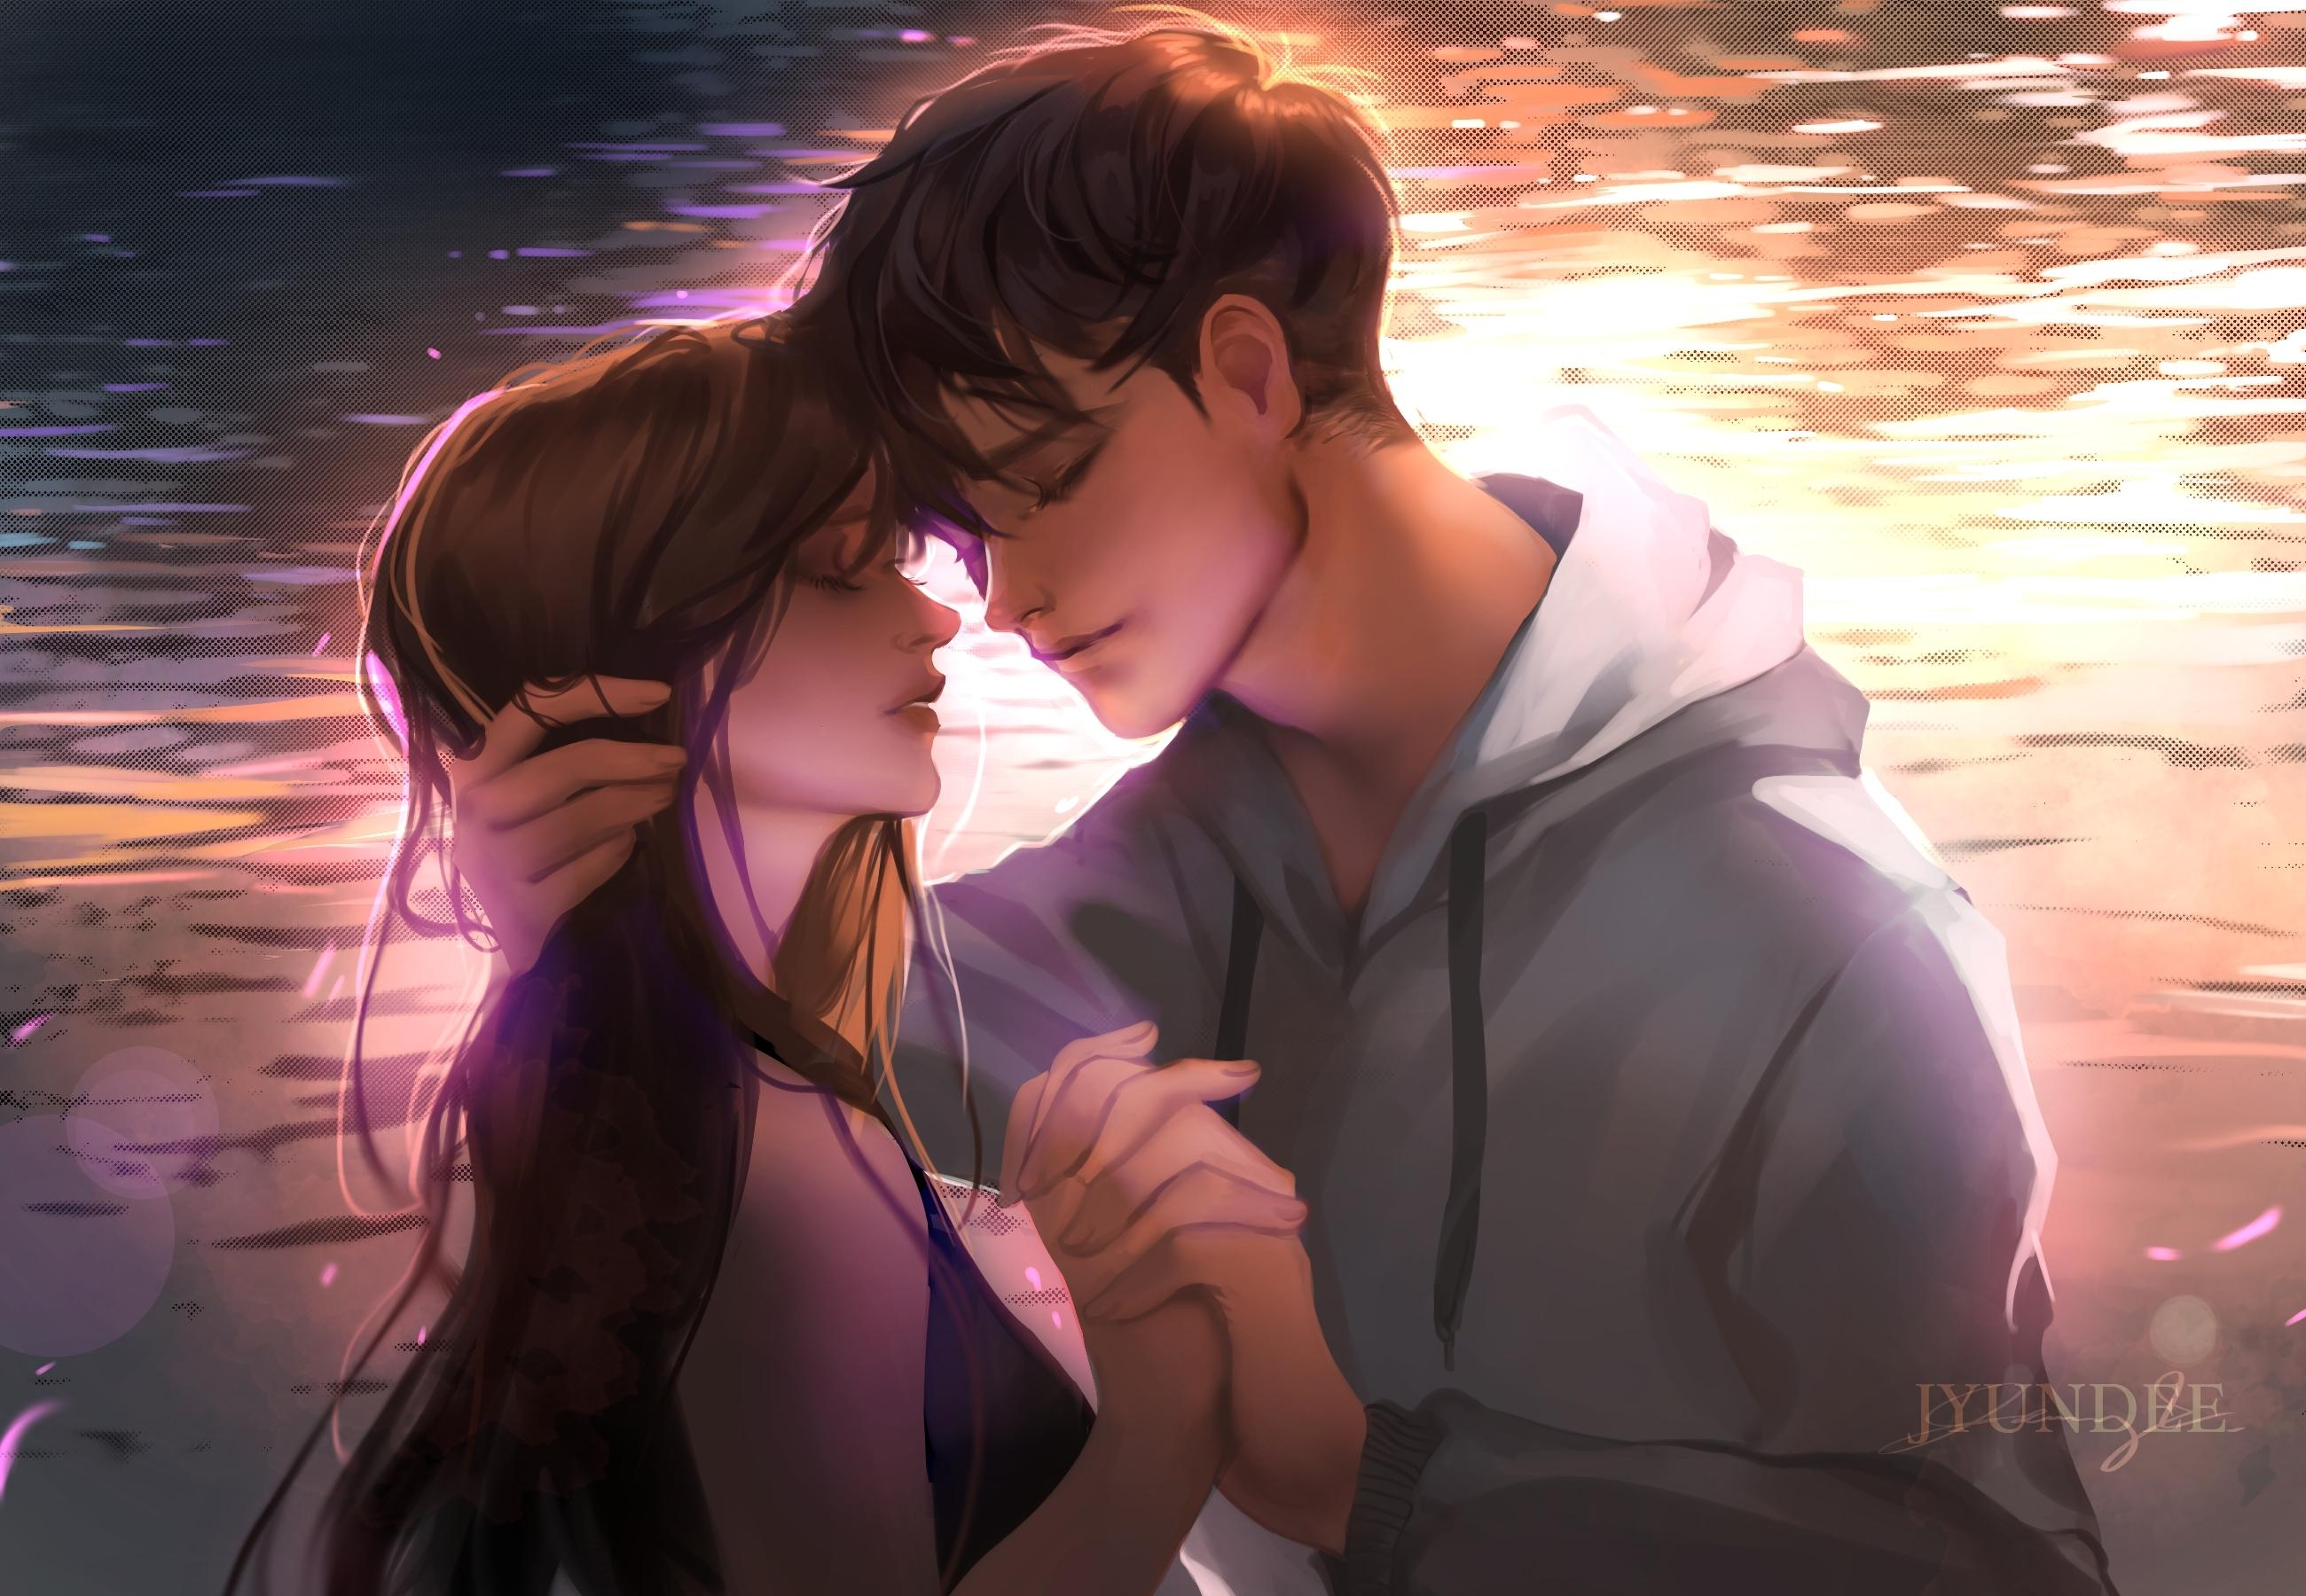 Anime Romantic Couple 2019 Wallpaper Hd Anime 4k Wallpapers